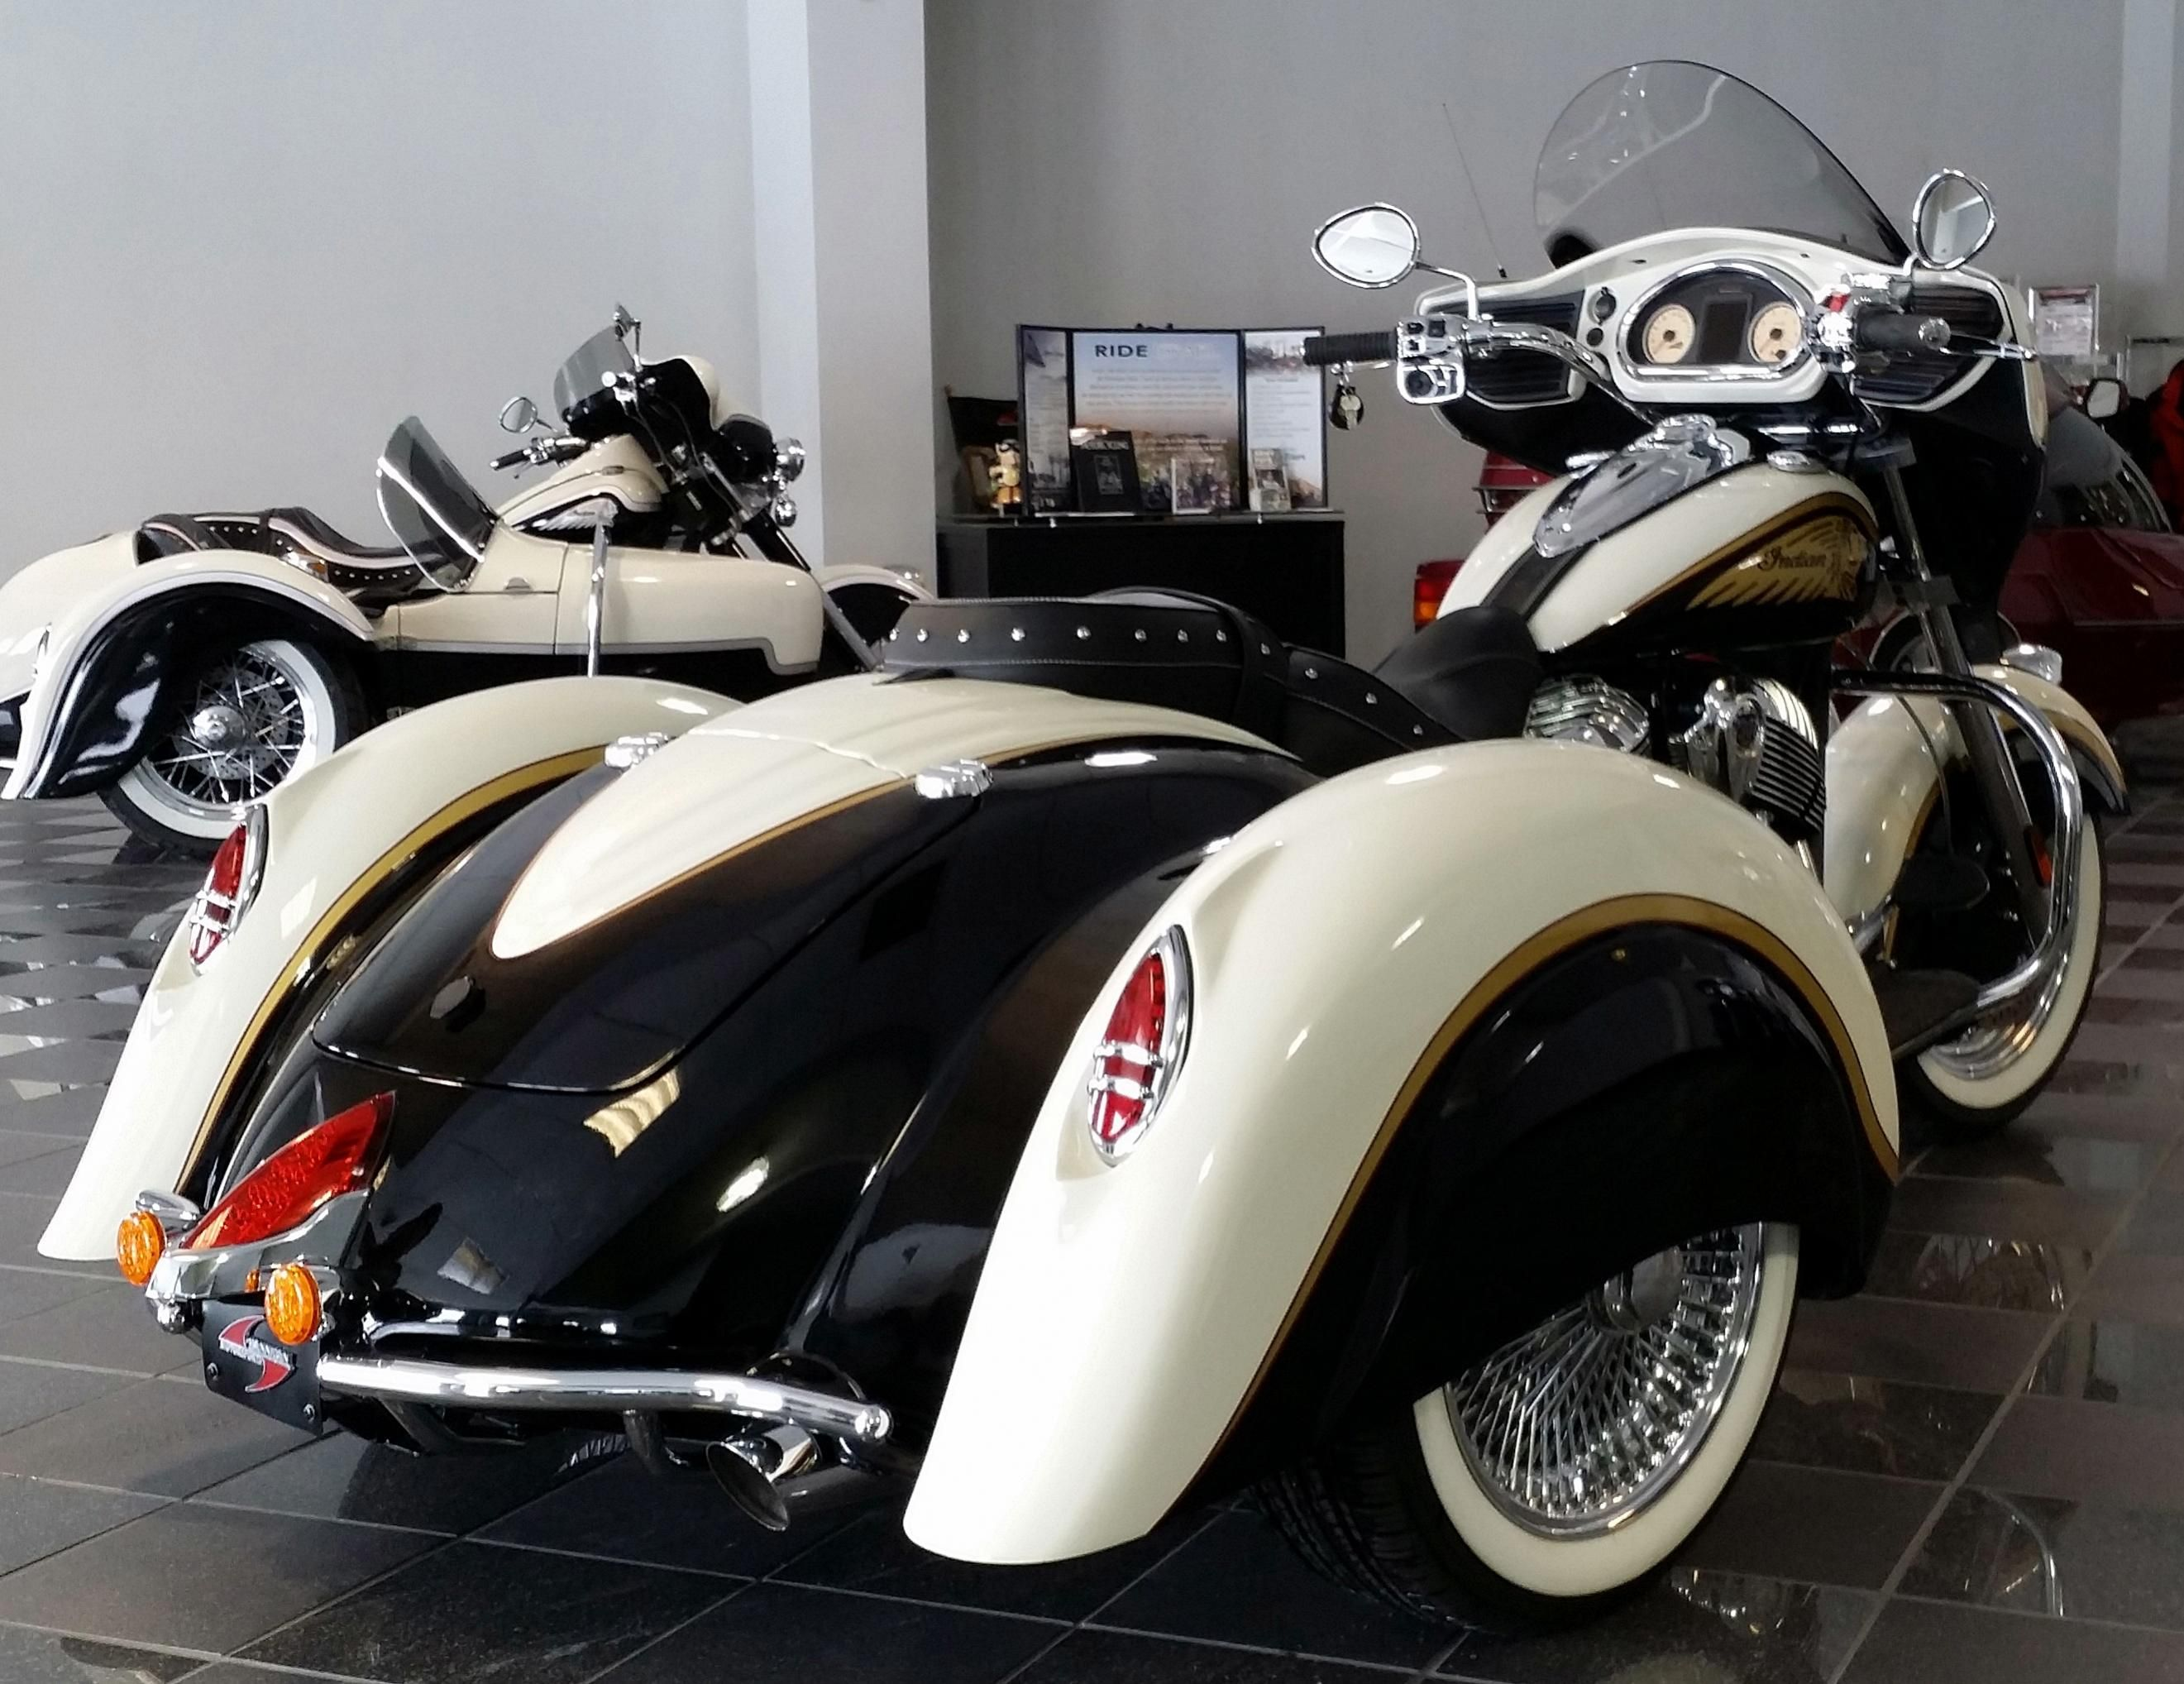 indian trike trikes pinterest moto deux roues and voiture. Black Bedroom Furniture Sets. Home Design Ideas